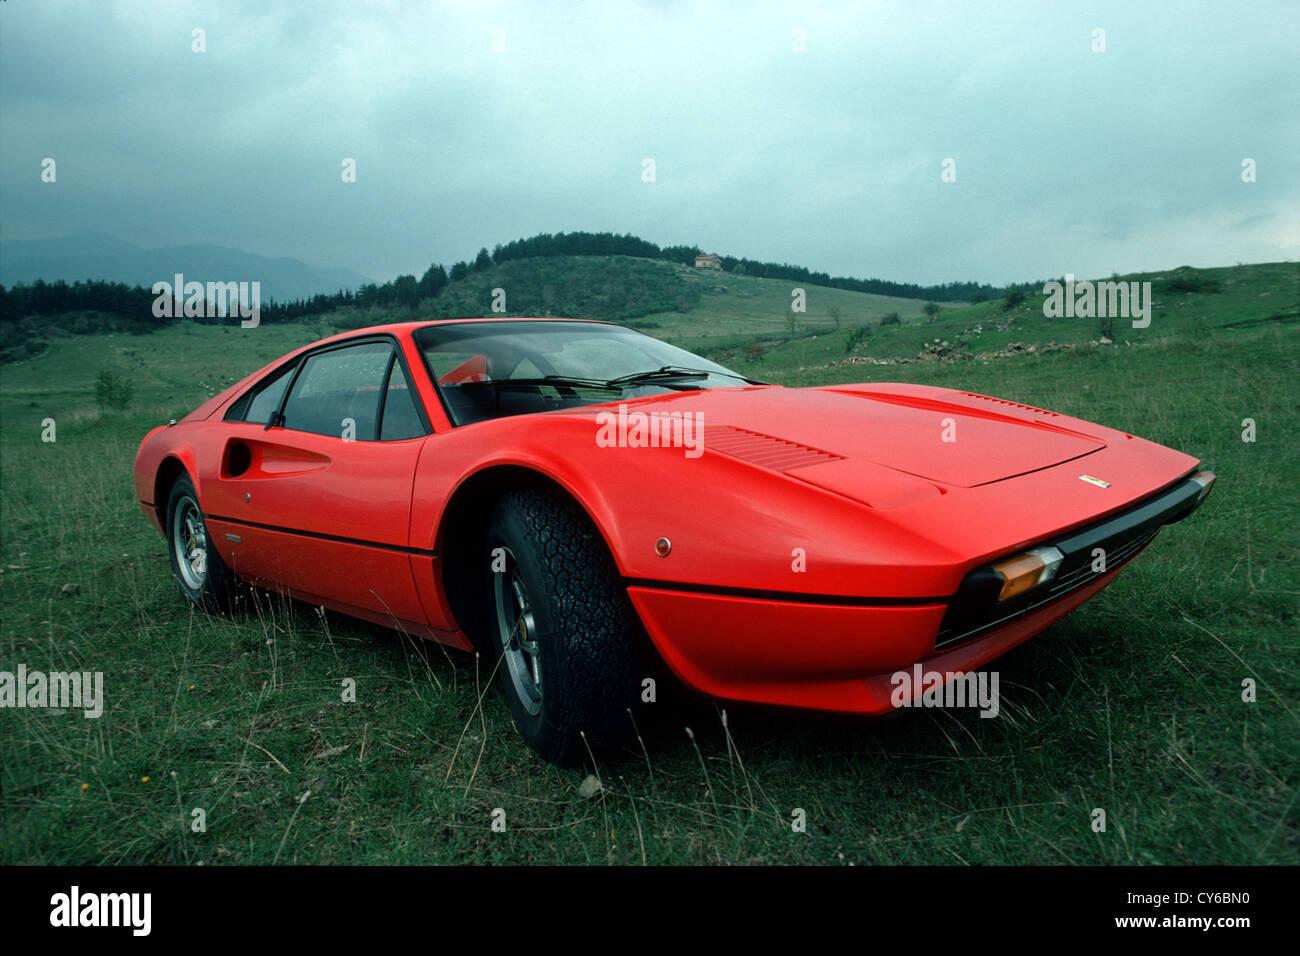 Red Ferrari 308 - Stock Image